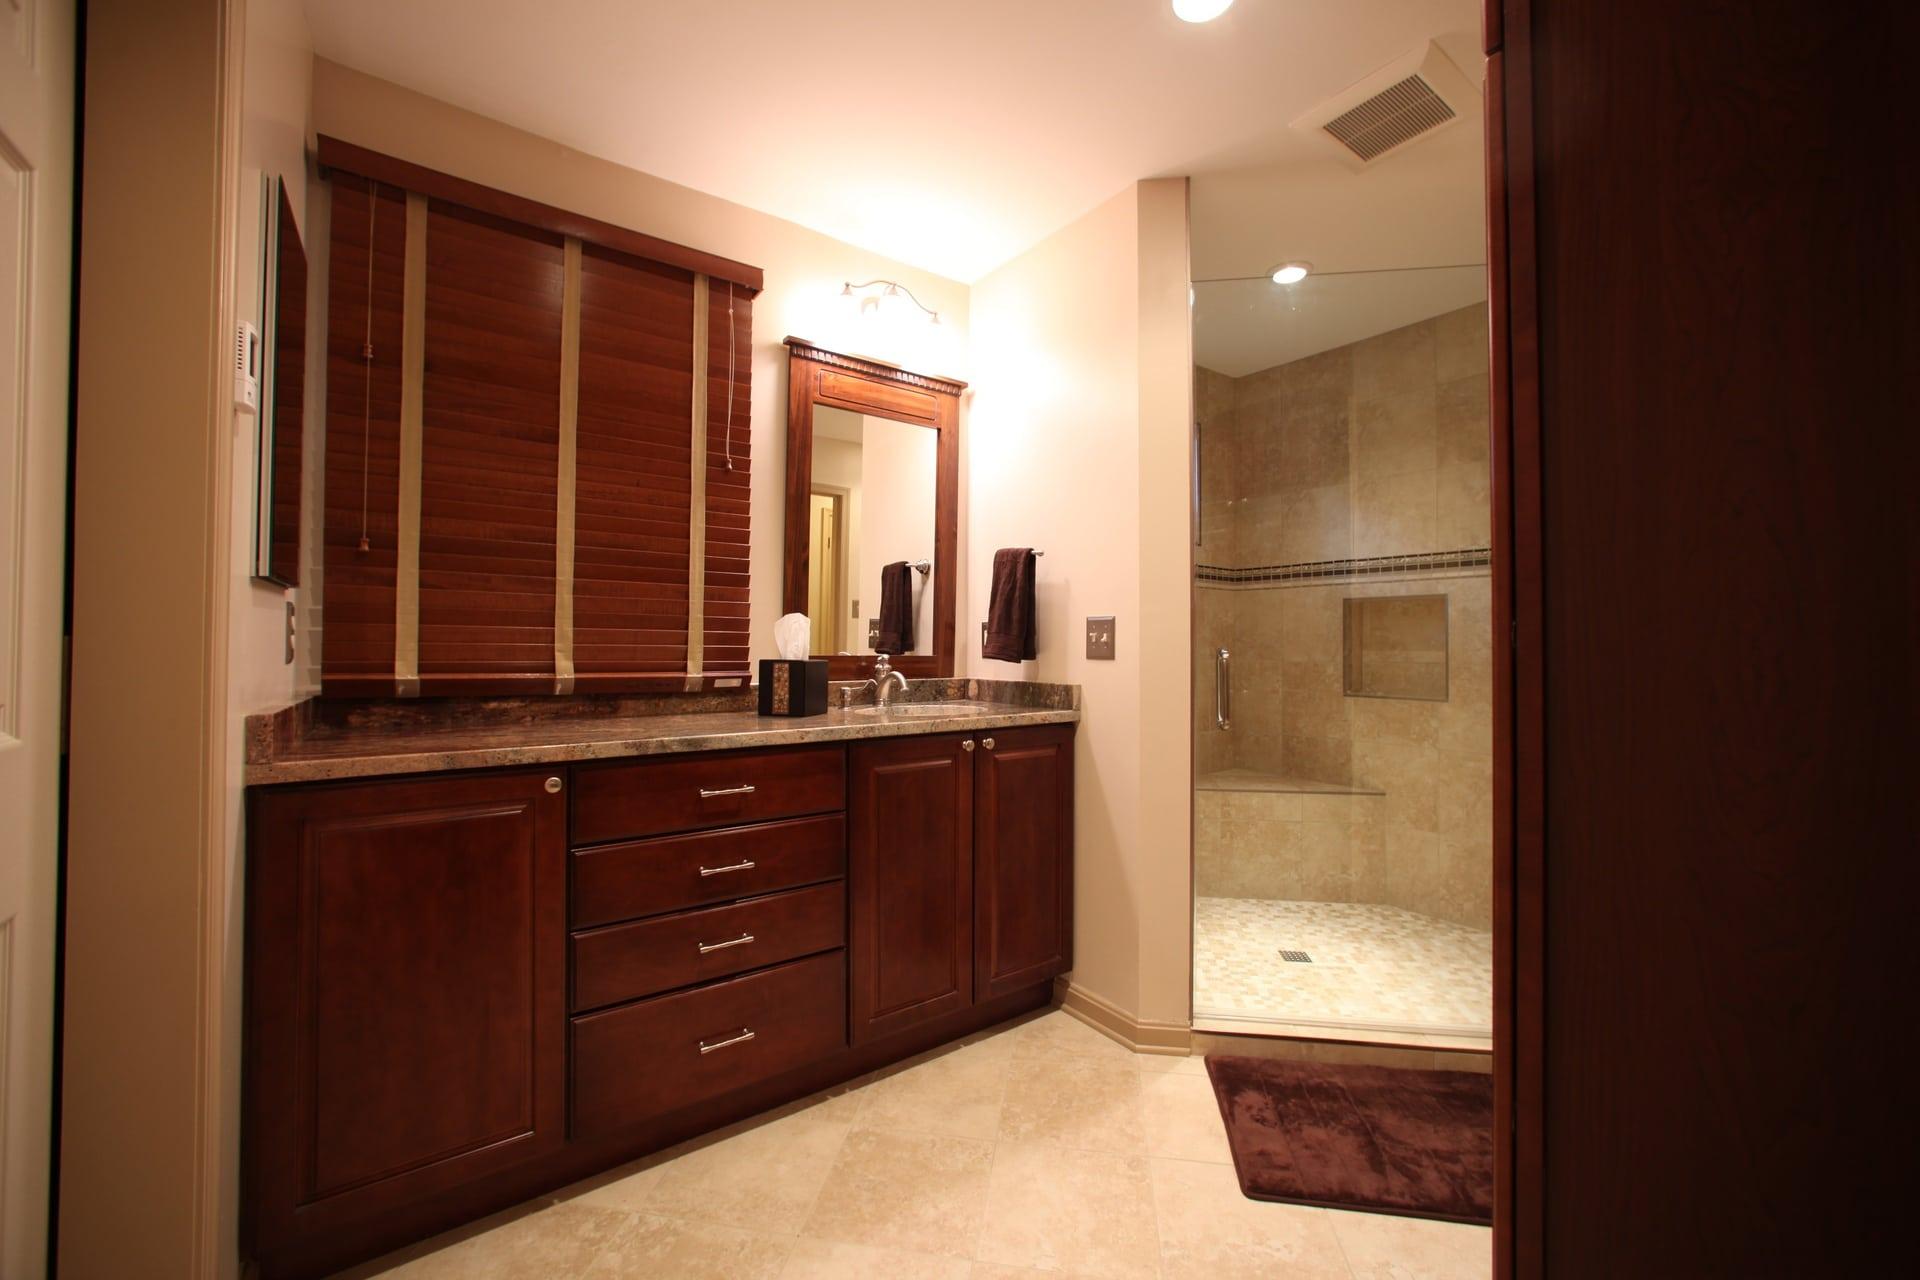 Bathroom Remodel - Hambleton Construction (1)